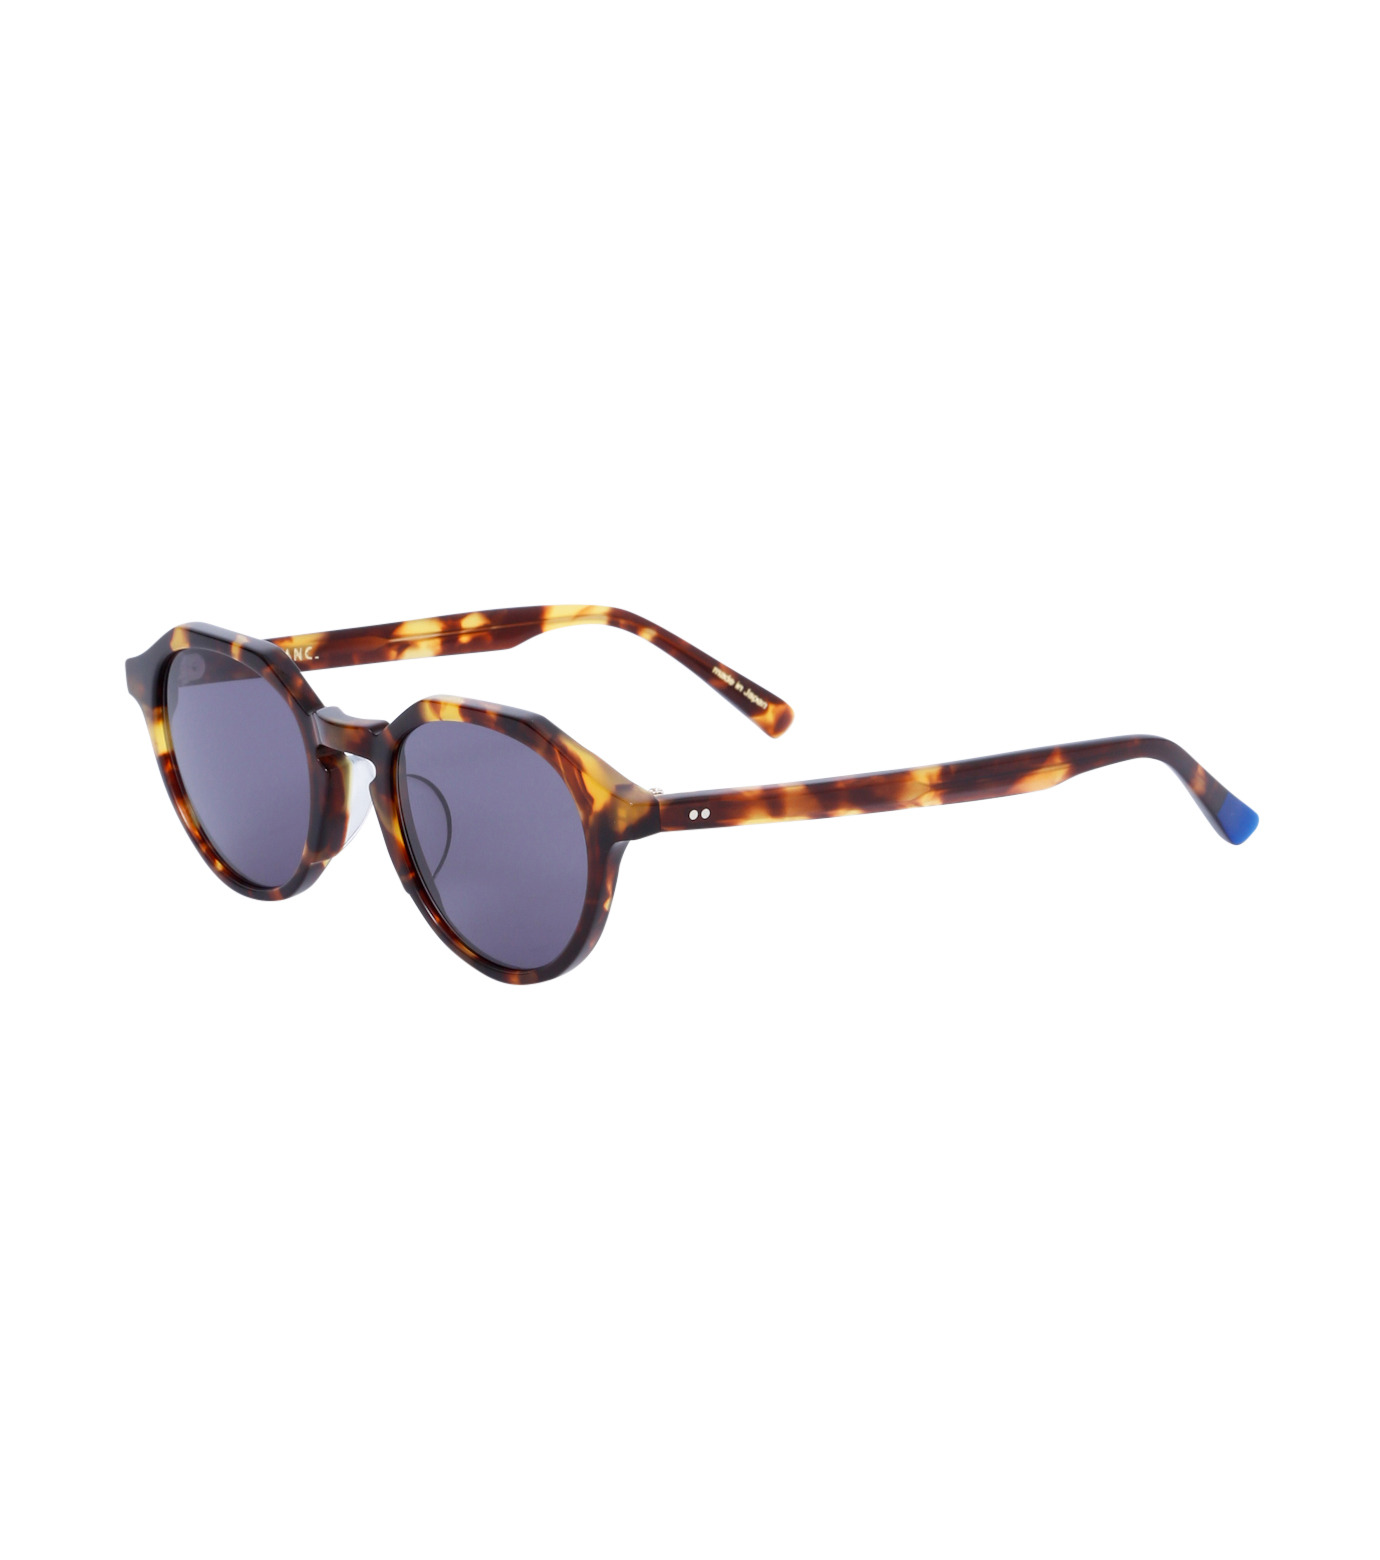 BLANC(ブラン)のOctagon Sunglass-BROWN(アイウェア/eyewear)-BM001-42 拡大詳細画像1